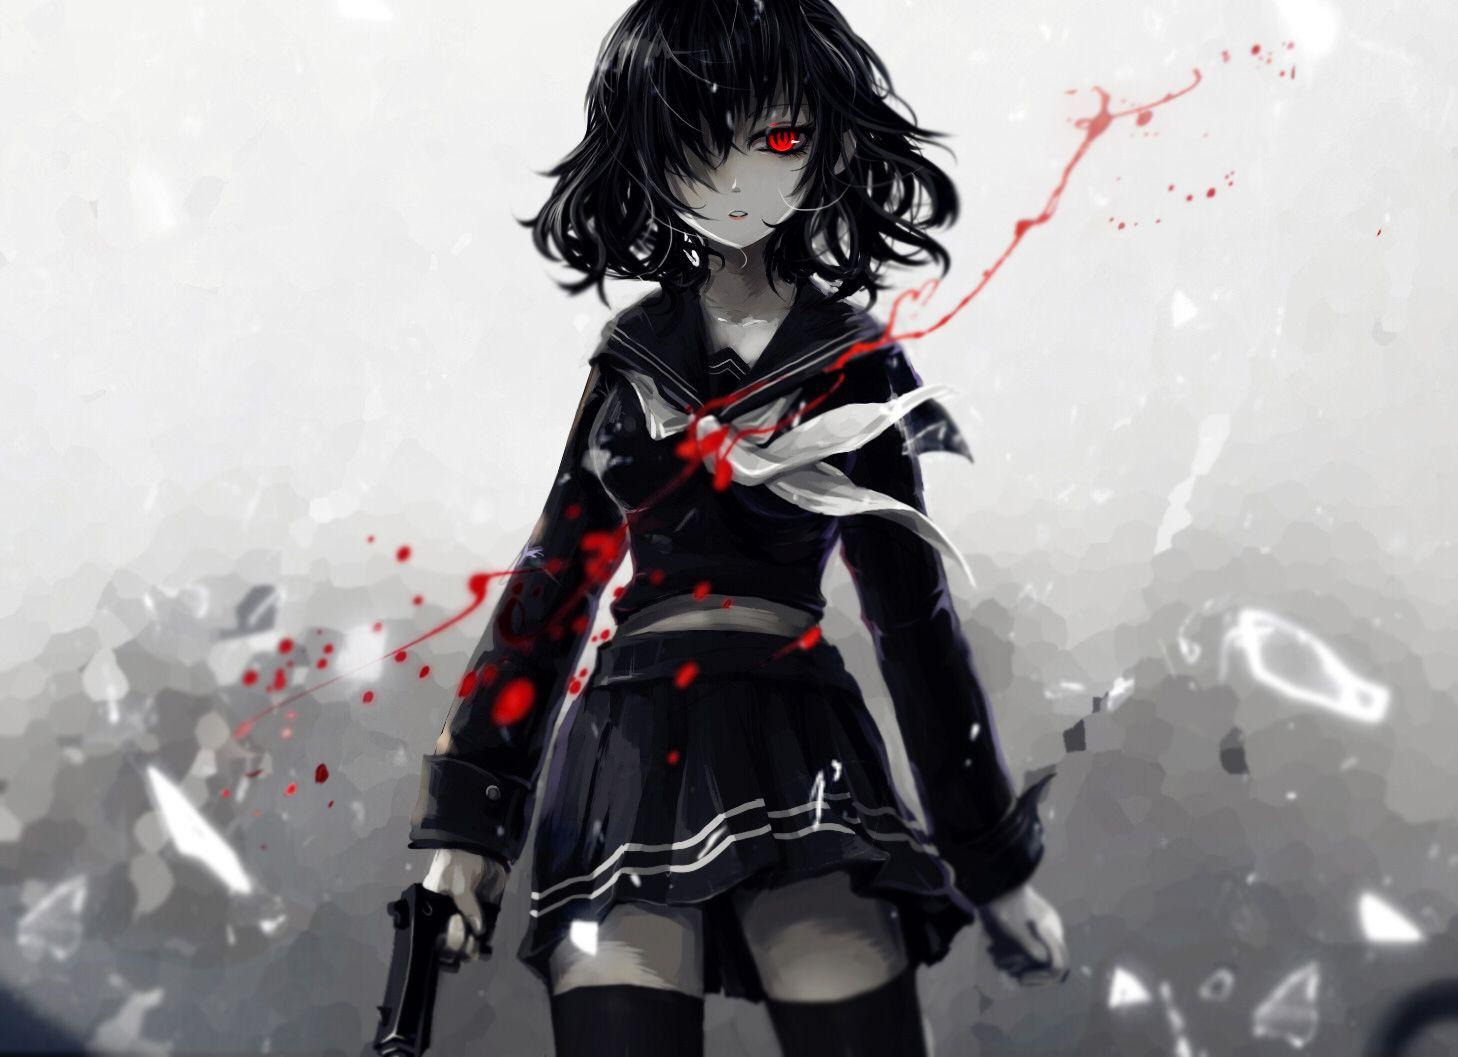 1girl aoiakamaou ascot black_hair blood cowboy_shot glass